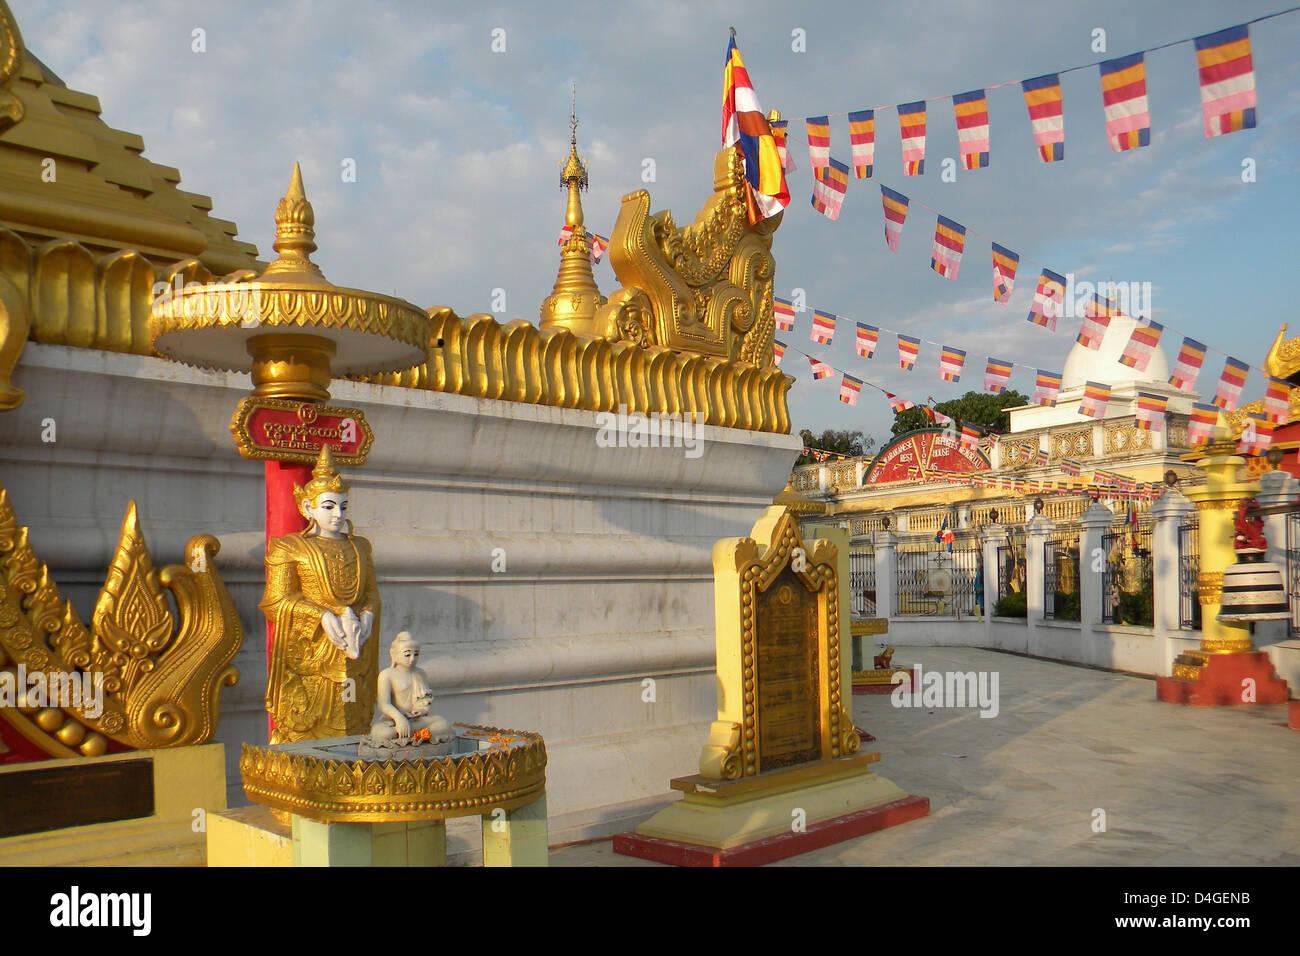 L'Inde, le Bihar, Khushinagar, temple Mahaparinirvana Photo Stock